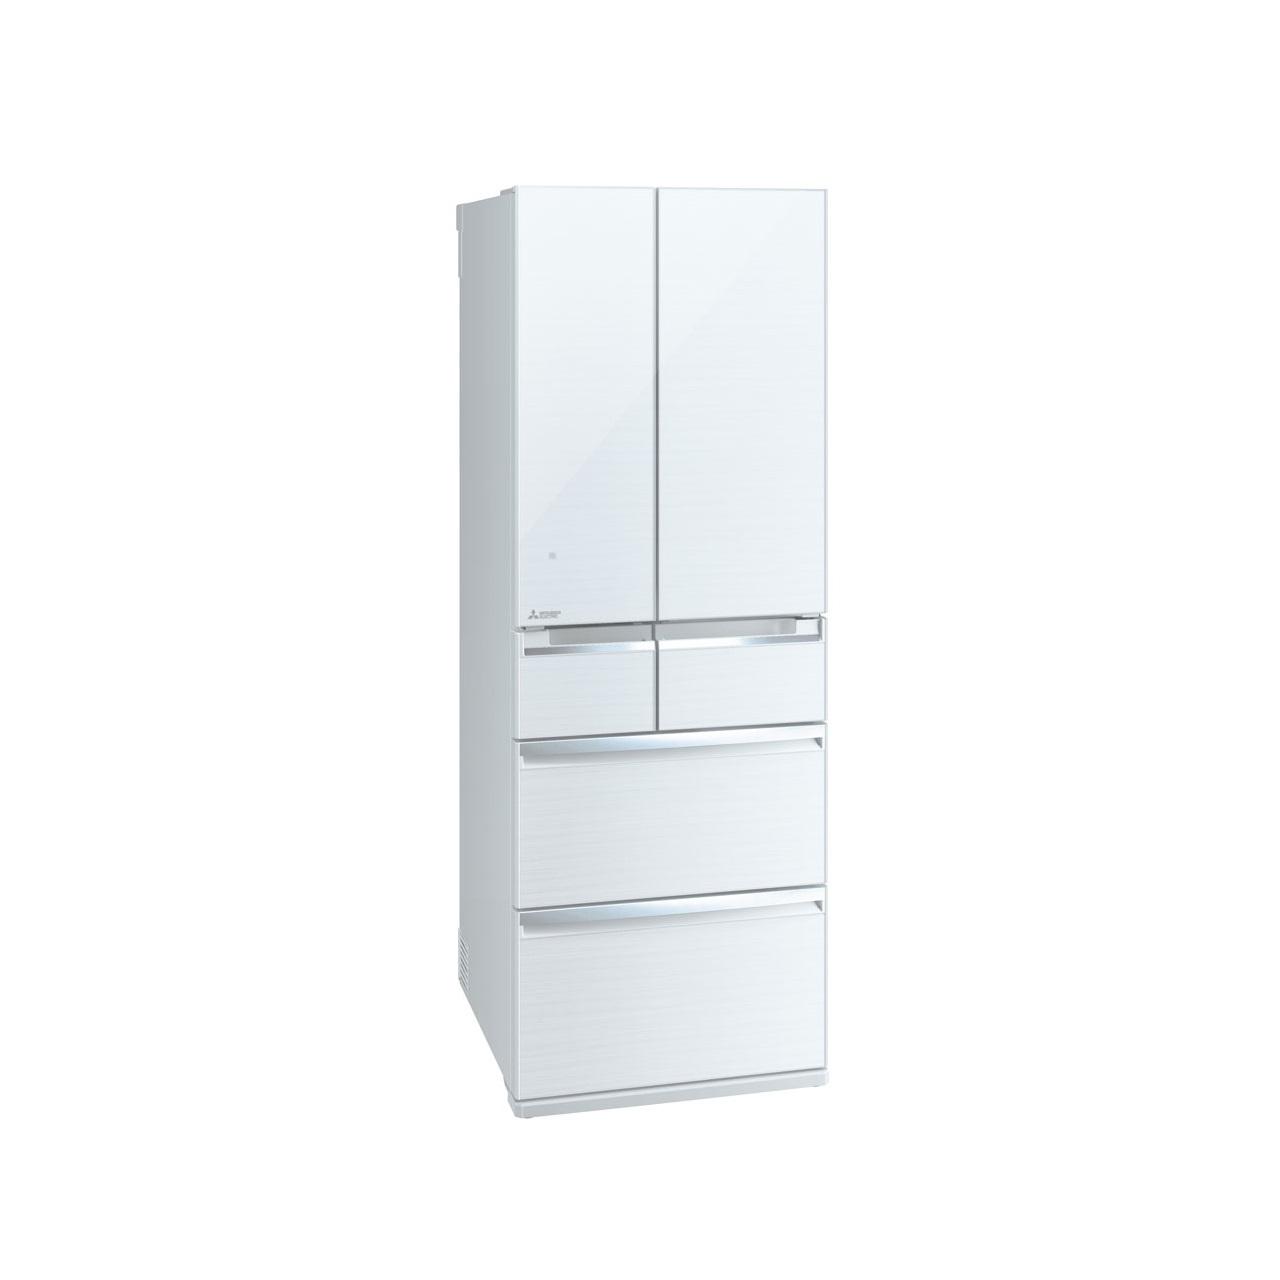 三菱MR-WX47C冷蔵庫